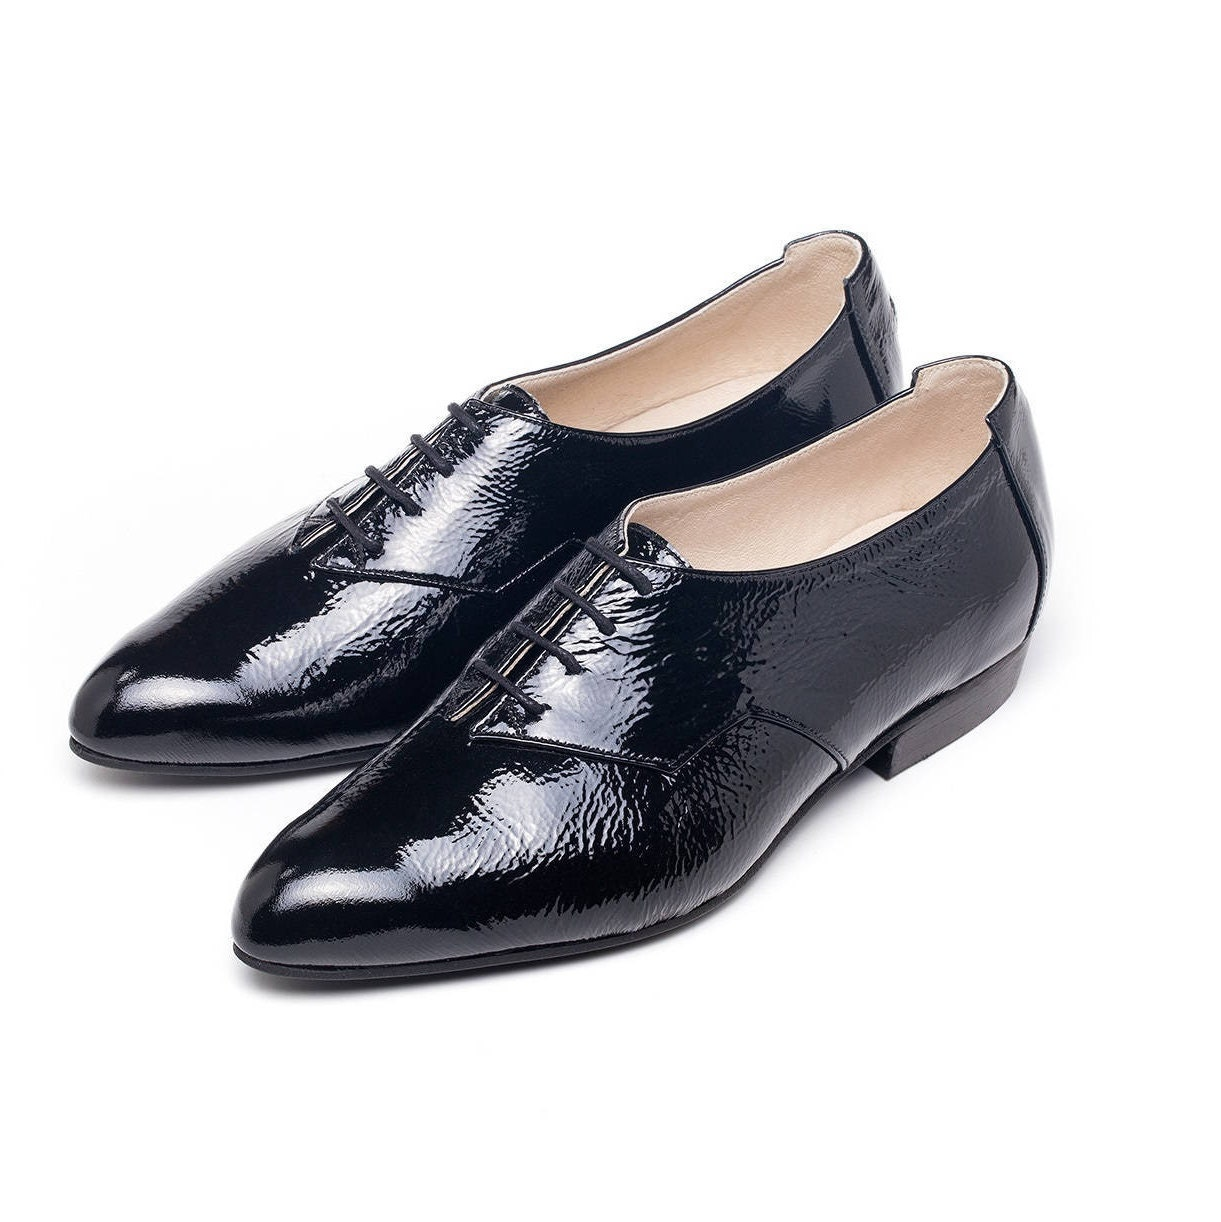 Sale Women oxford shoes black leather